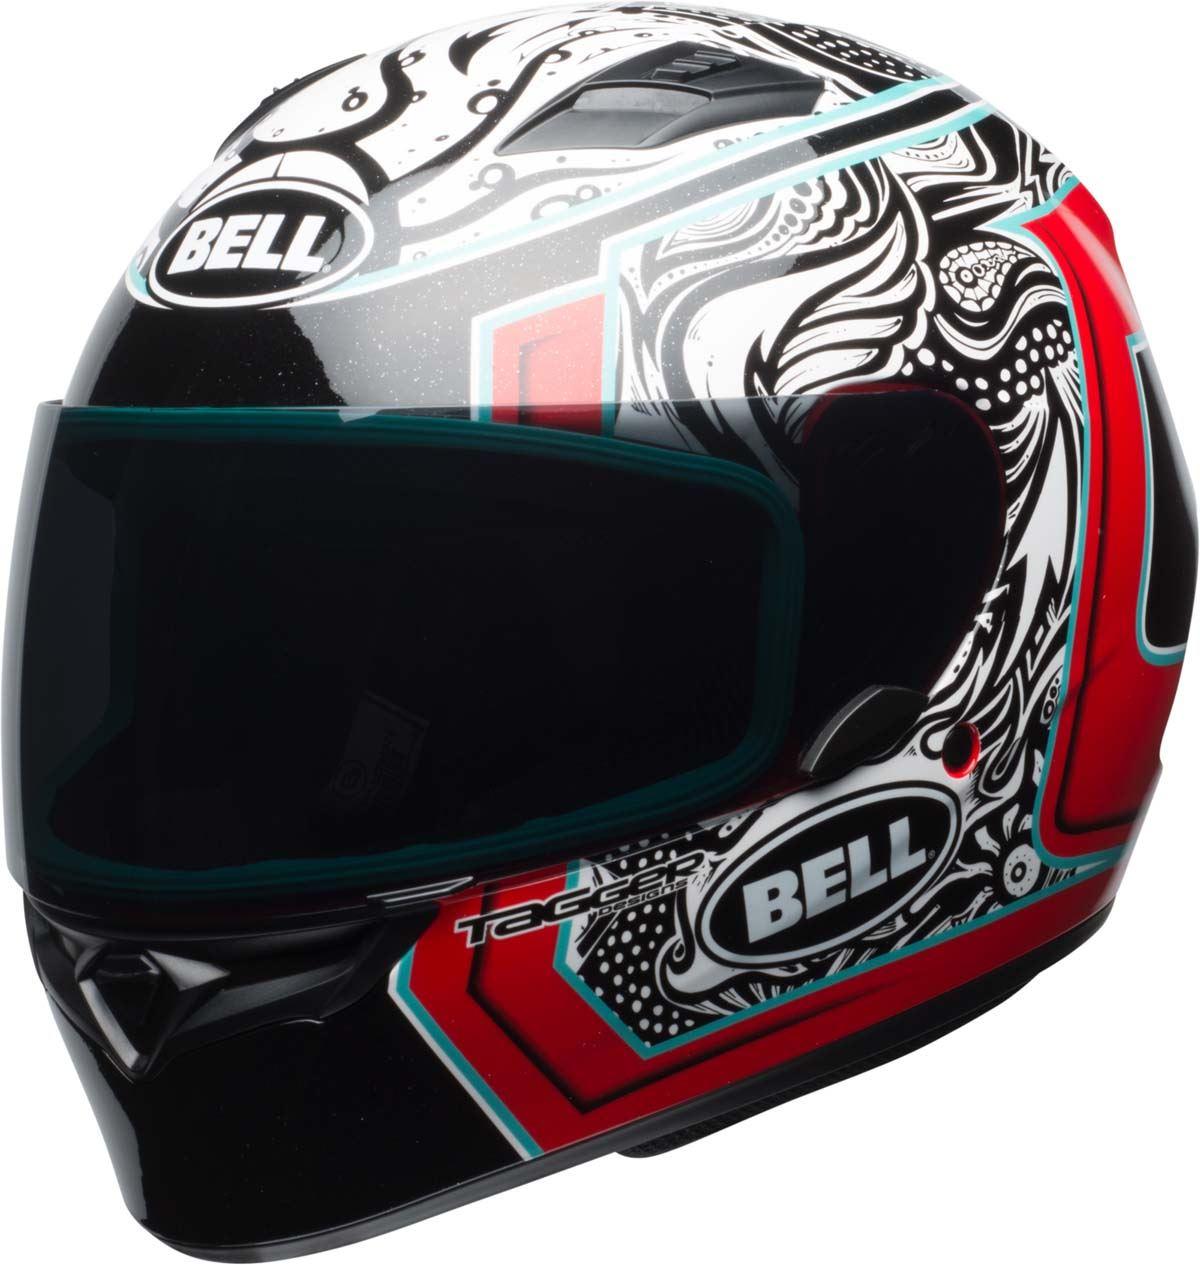 Bell-Qualifier-Helmet-Full-Face-Motorcycle-Clear-Shield-DOT-XS-3XL miniature 46